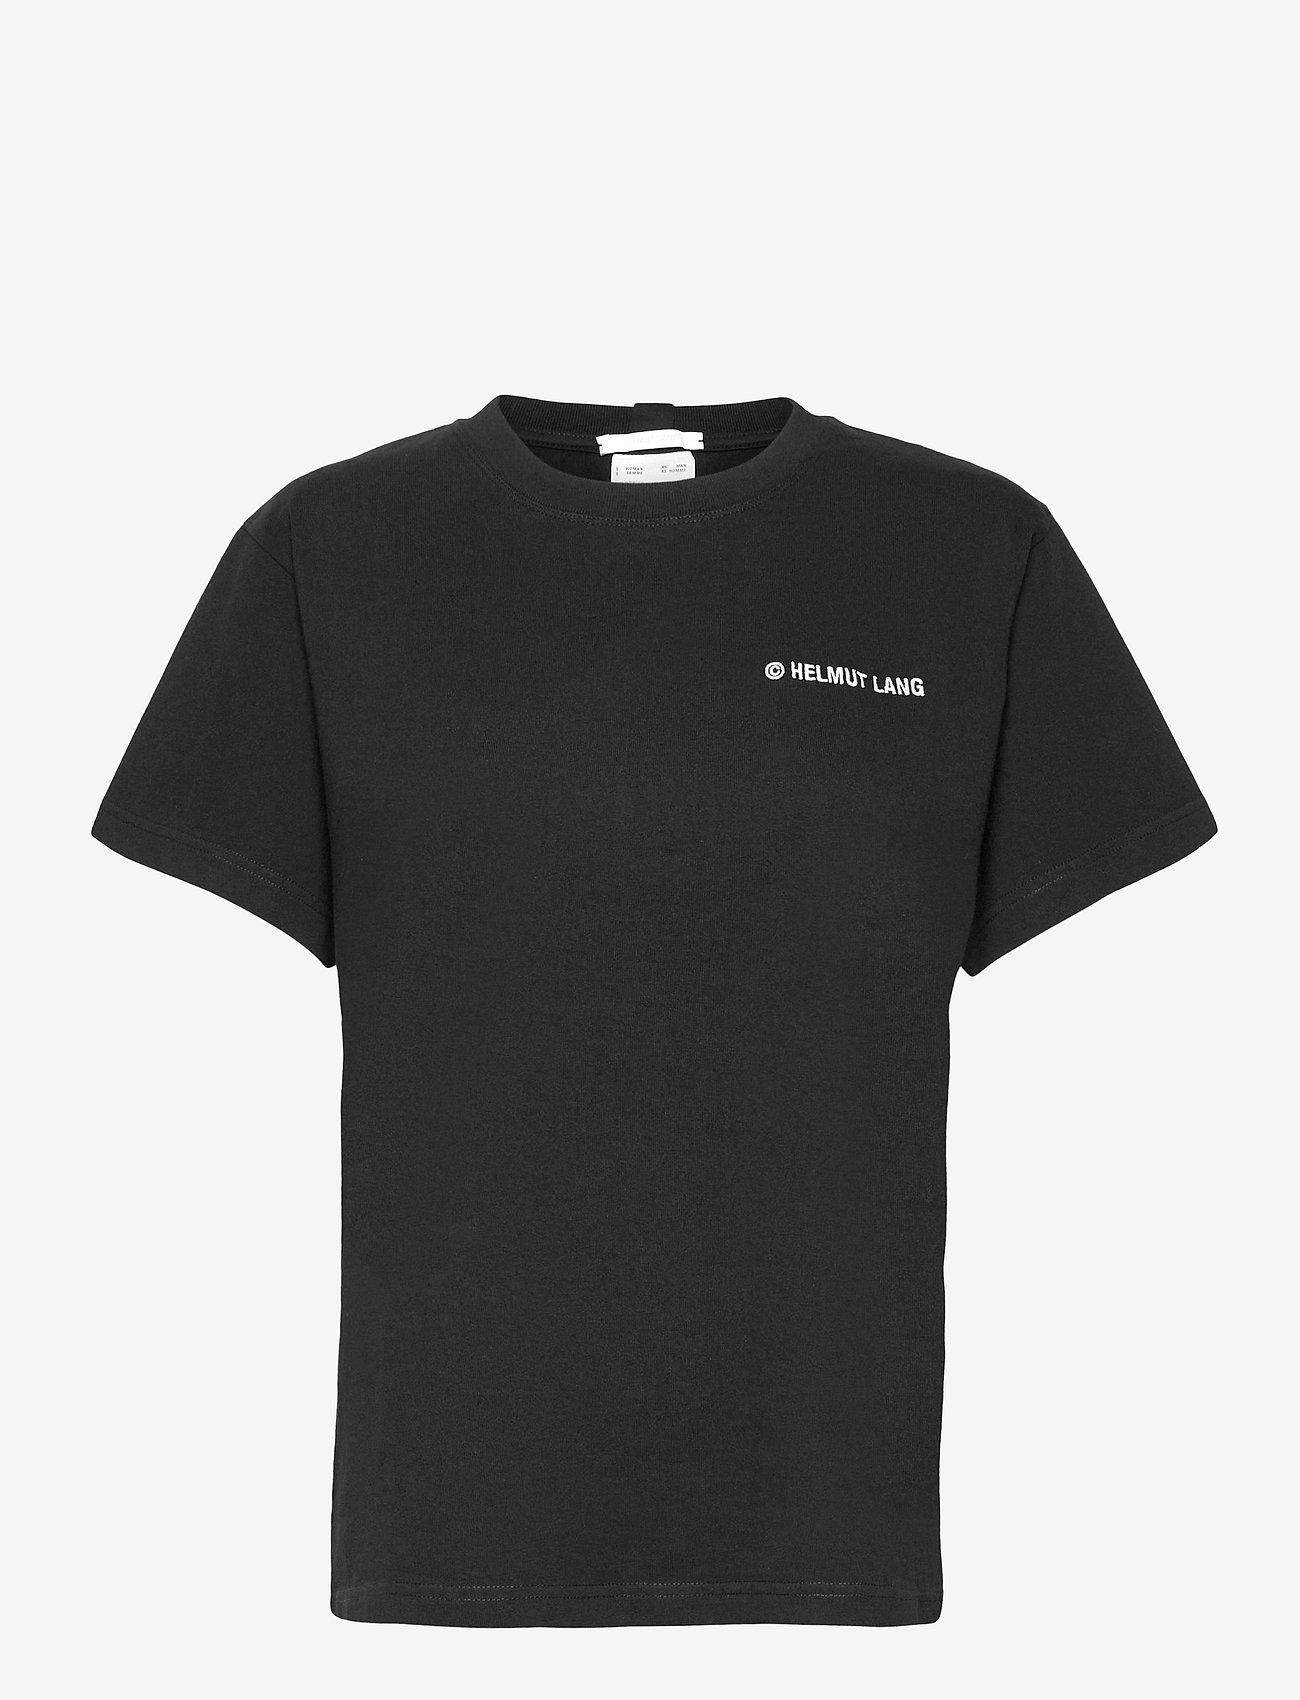 Helmut Lang - CLASSIC LOGO T.HVY C - t-shirts - black - 0